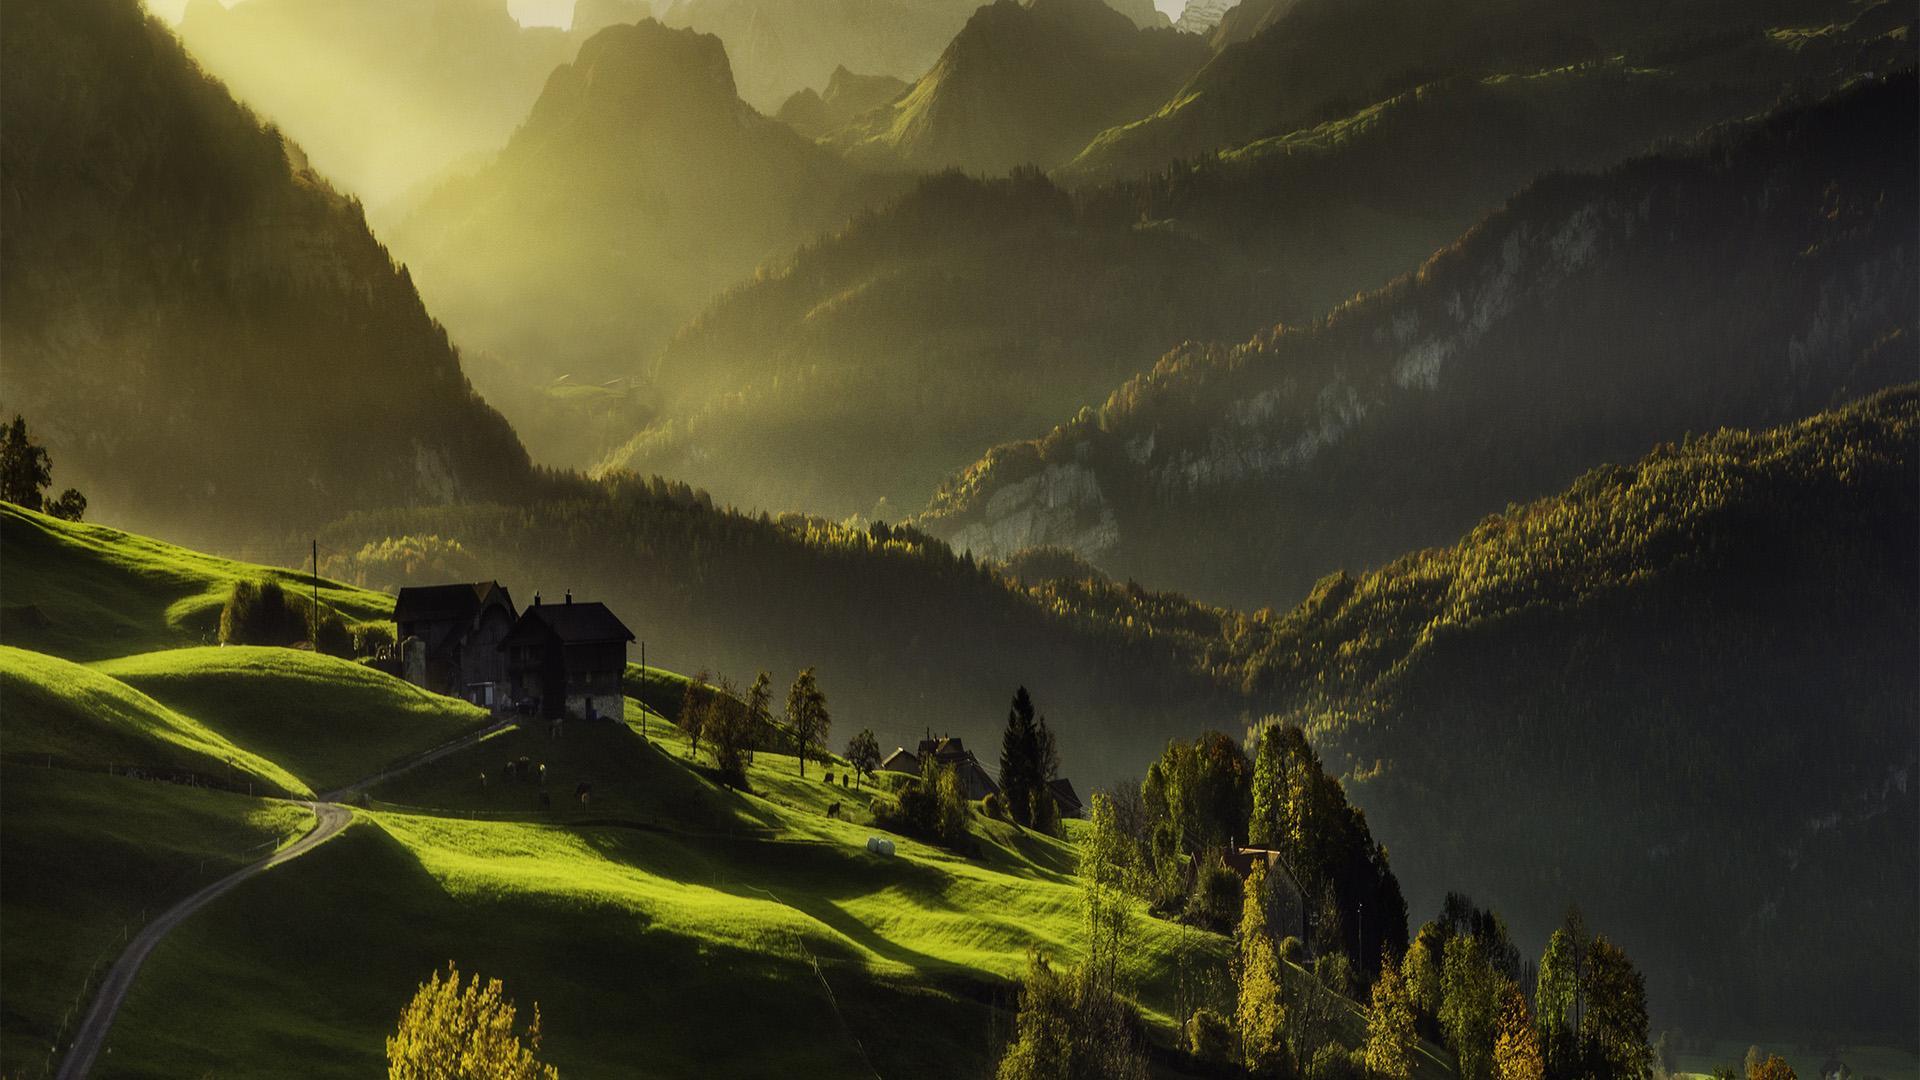 Landscape Wallpaper 1080p Sf Wallpaper